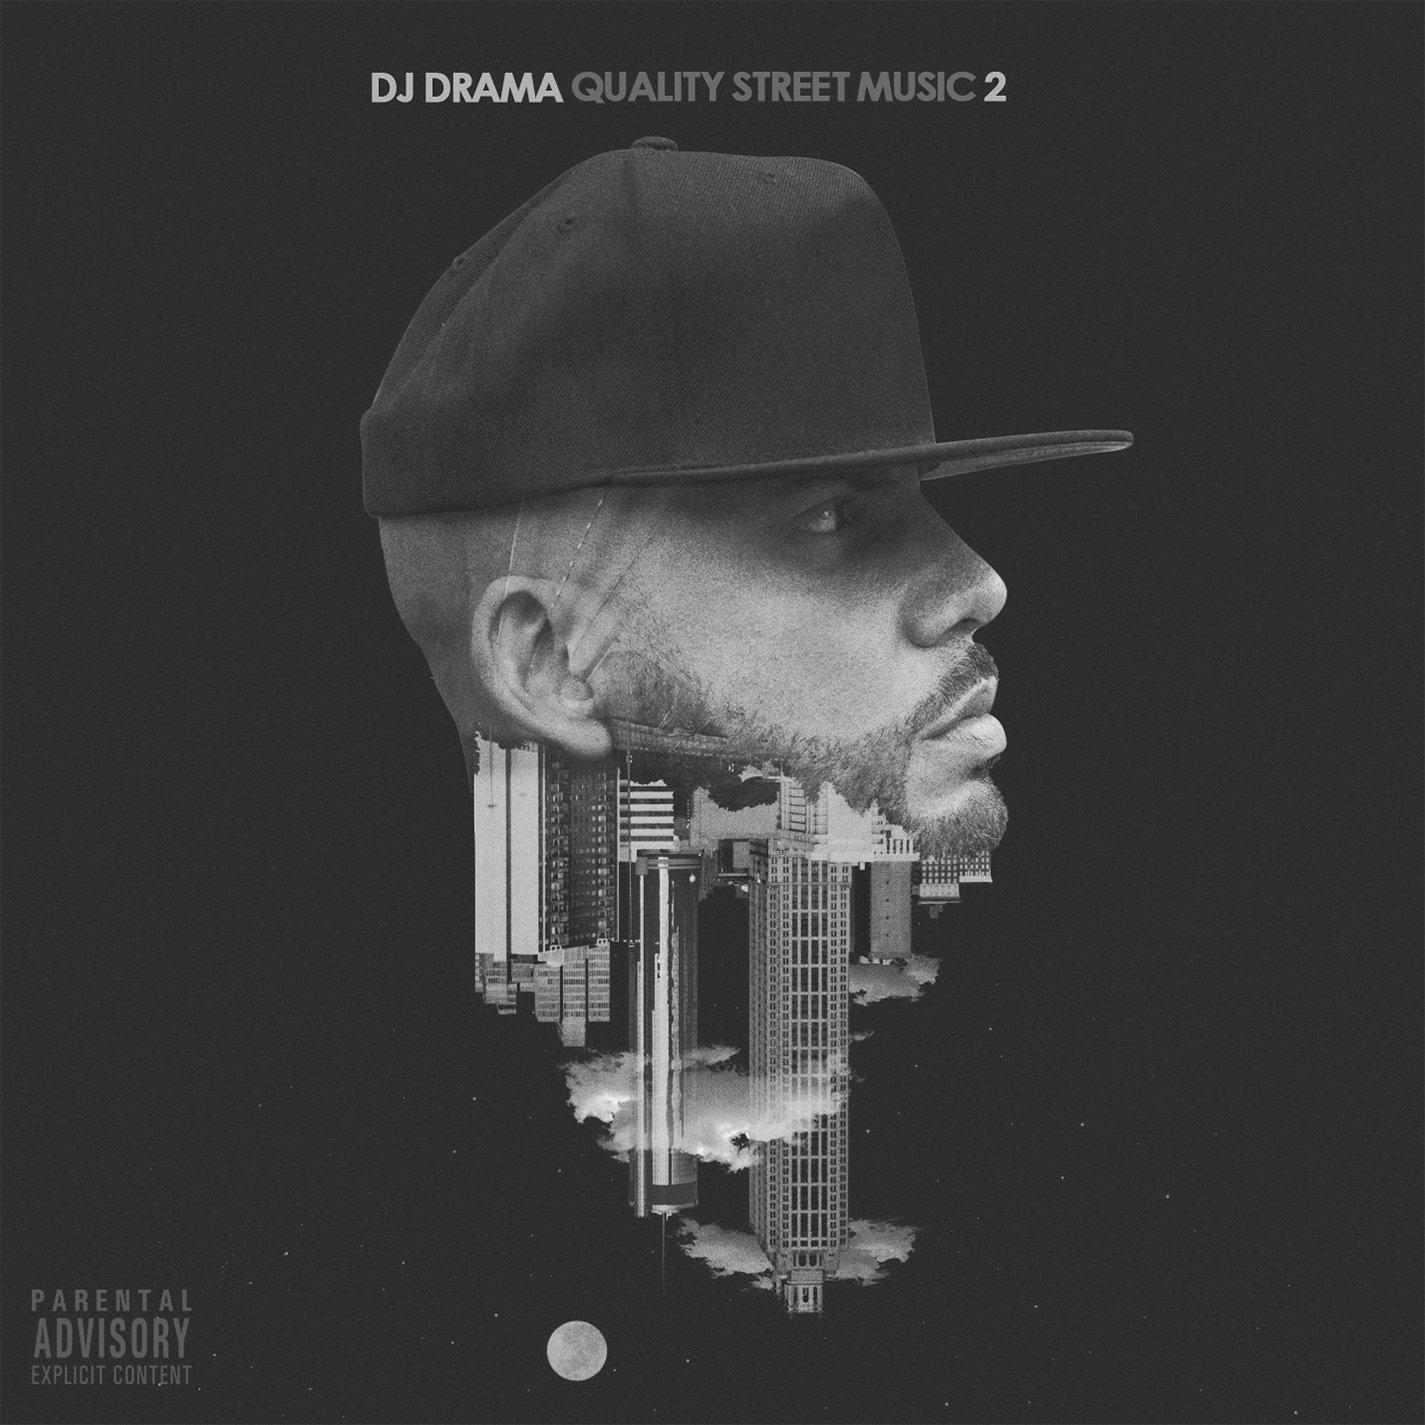 DJ Drama Quality Street Music 2